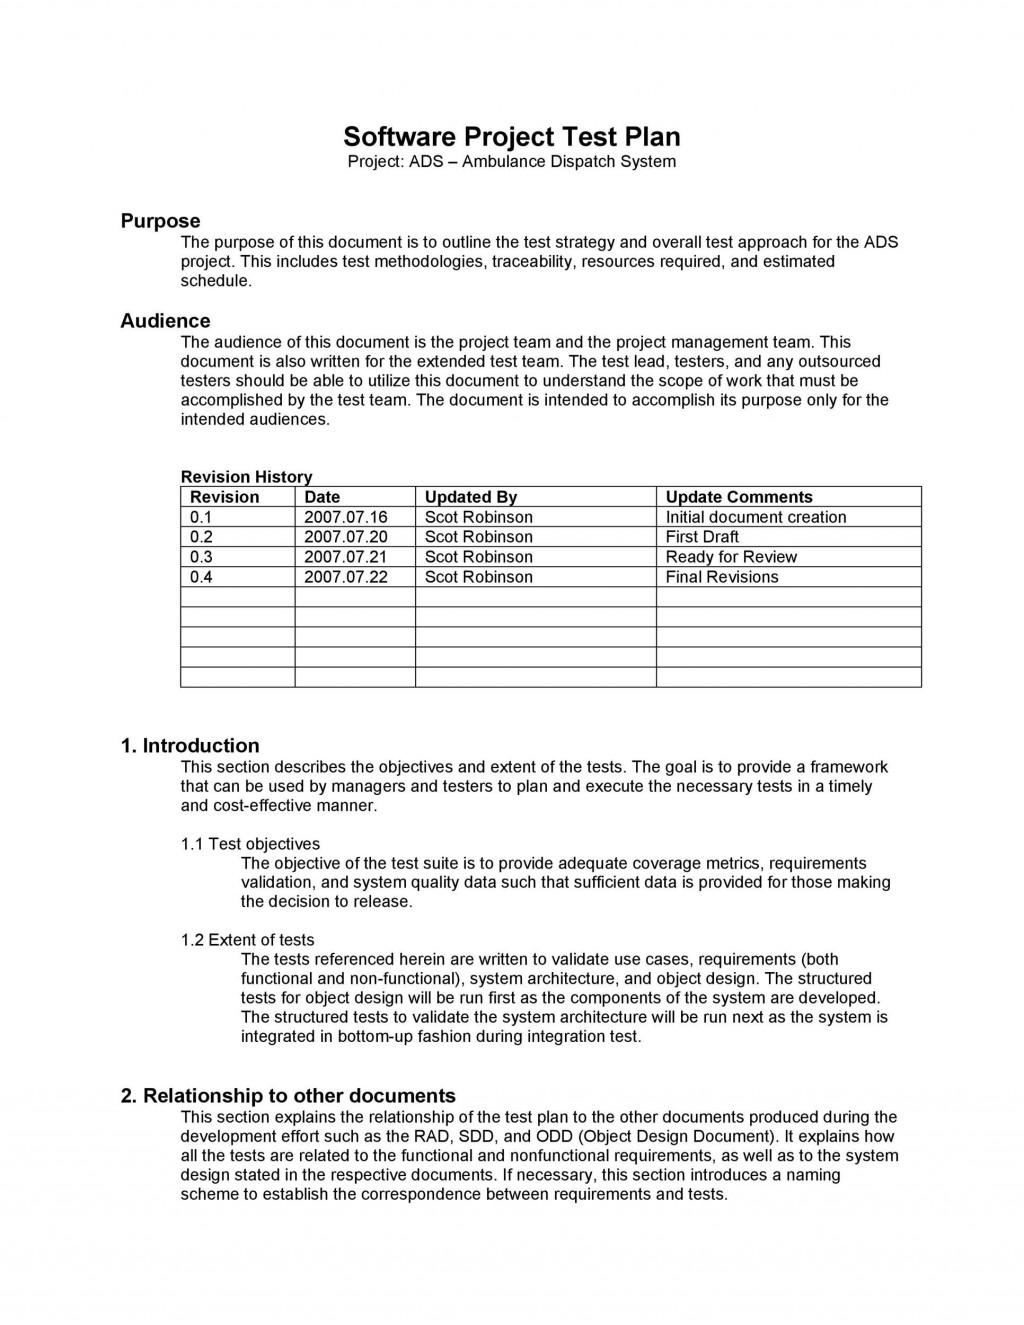 006 Remarkable Software Test Plan Template High Def  TemplatesLarge